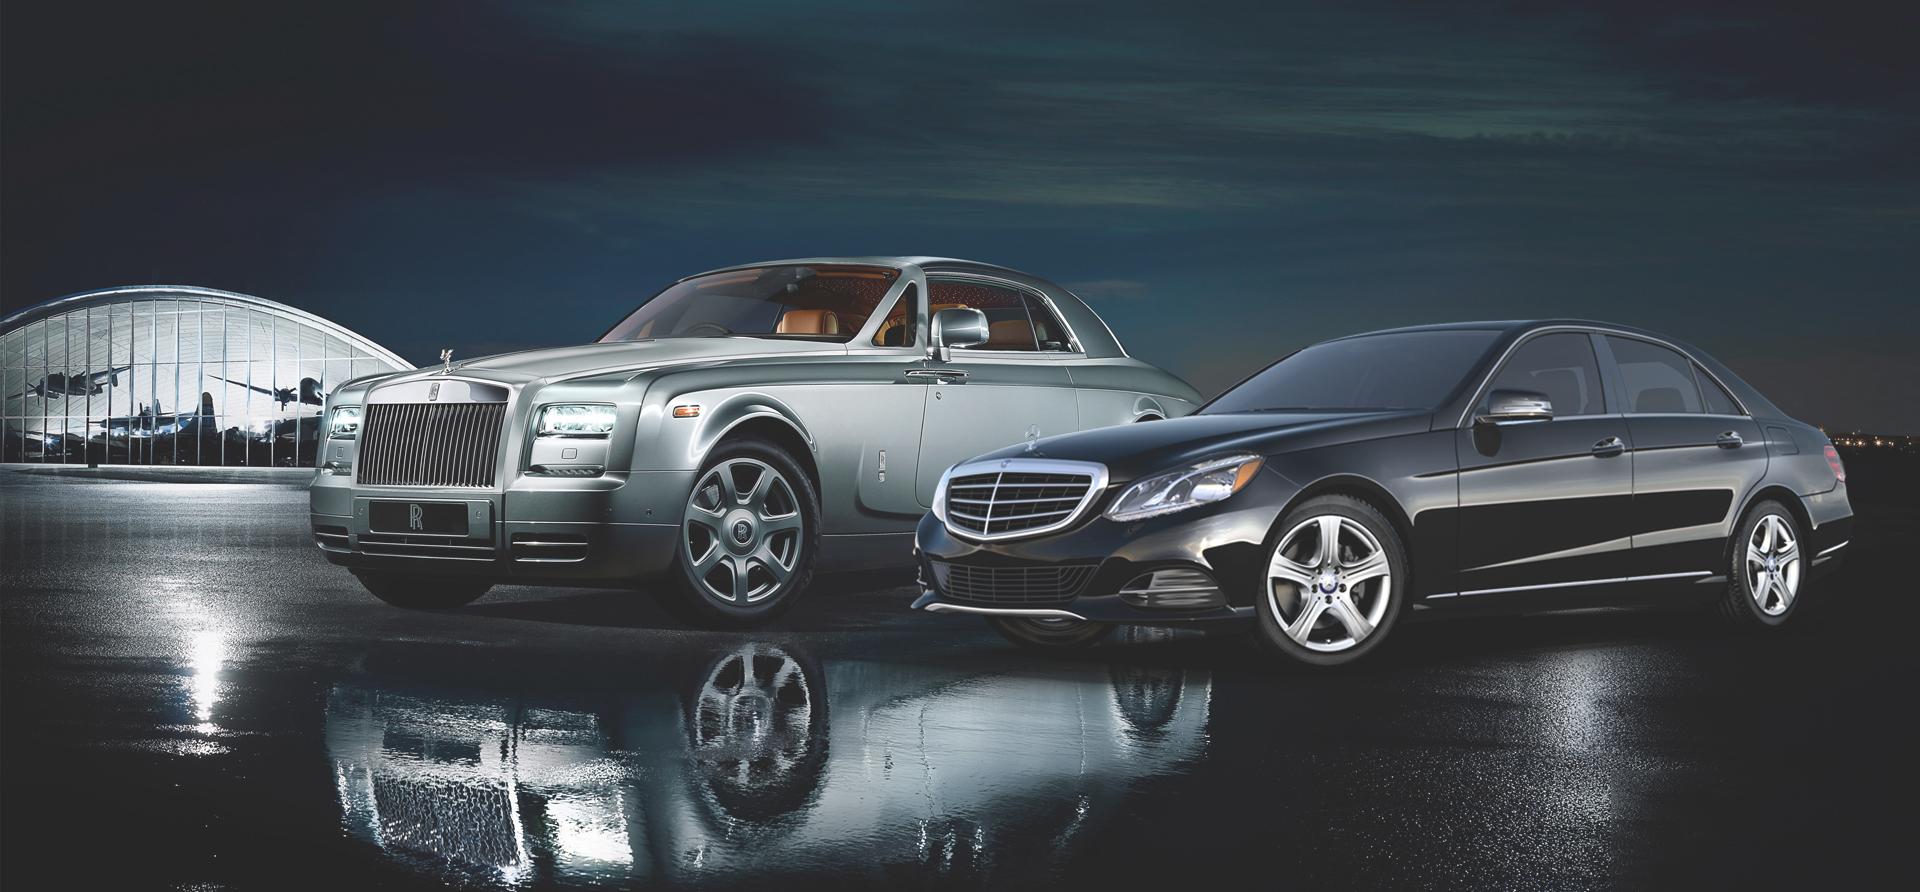 silverstar chauffeurs, corporate service, executive service, chauffeur driven car, chauffeur hire, chauffeur car, car hire